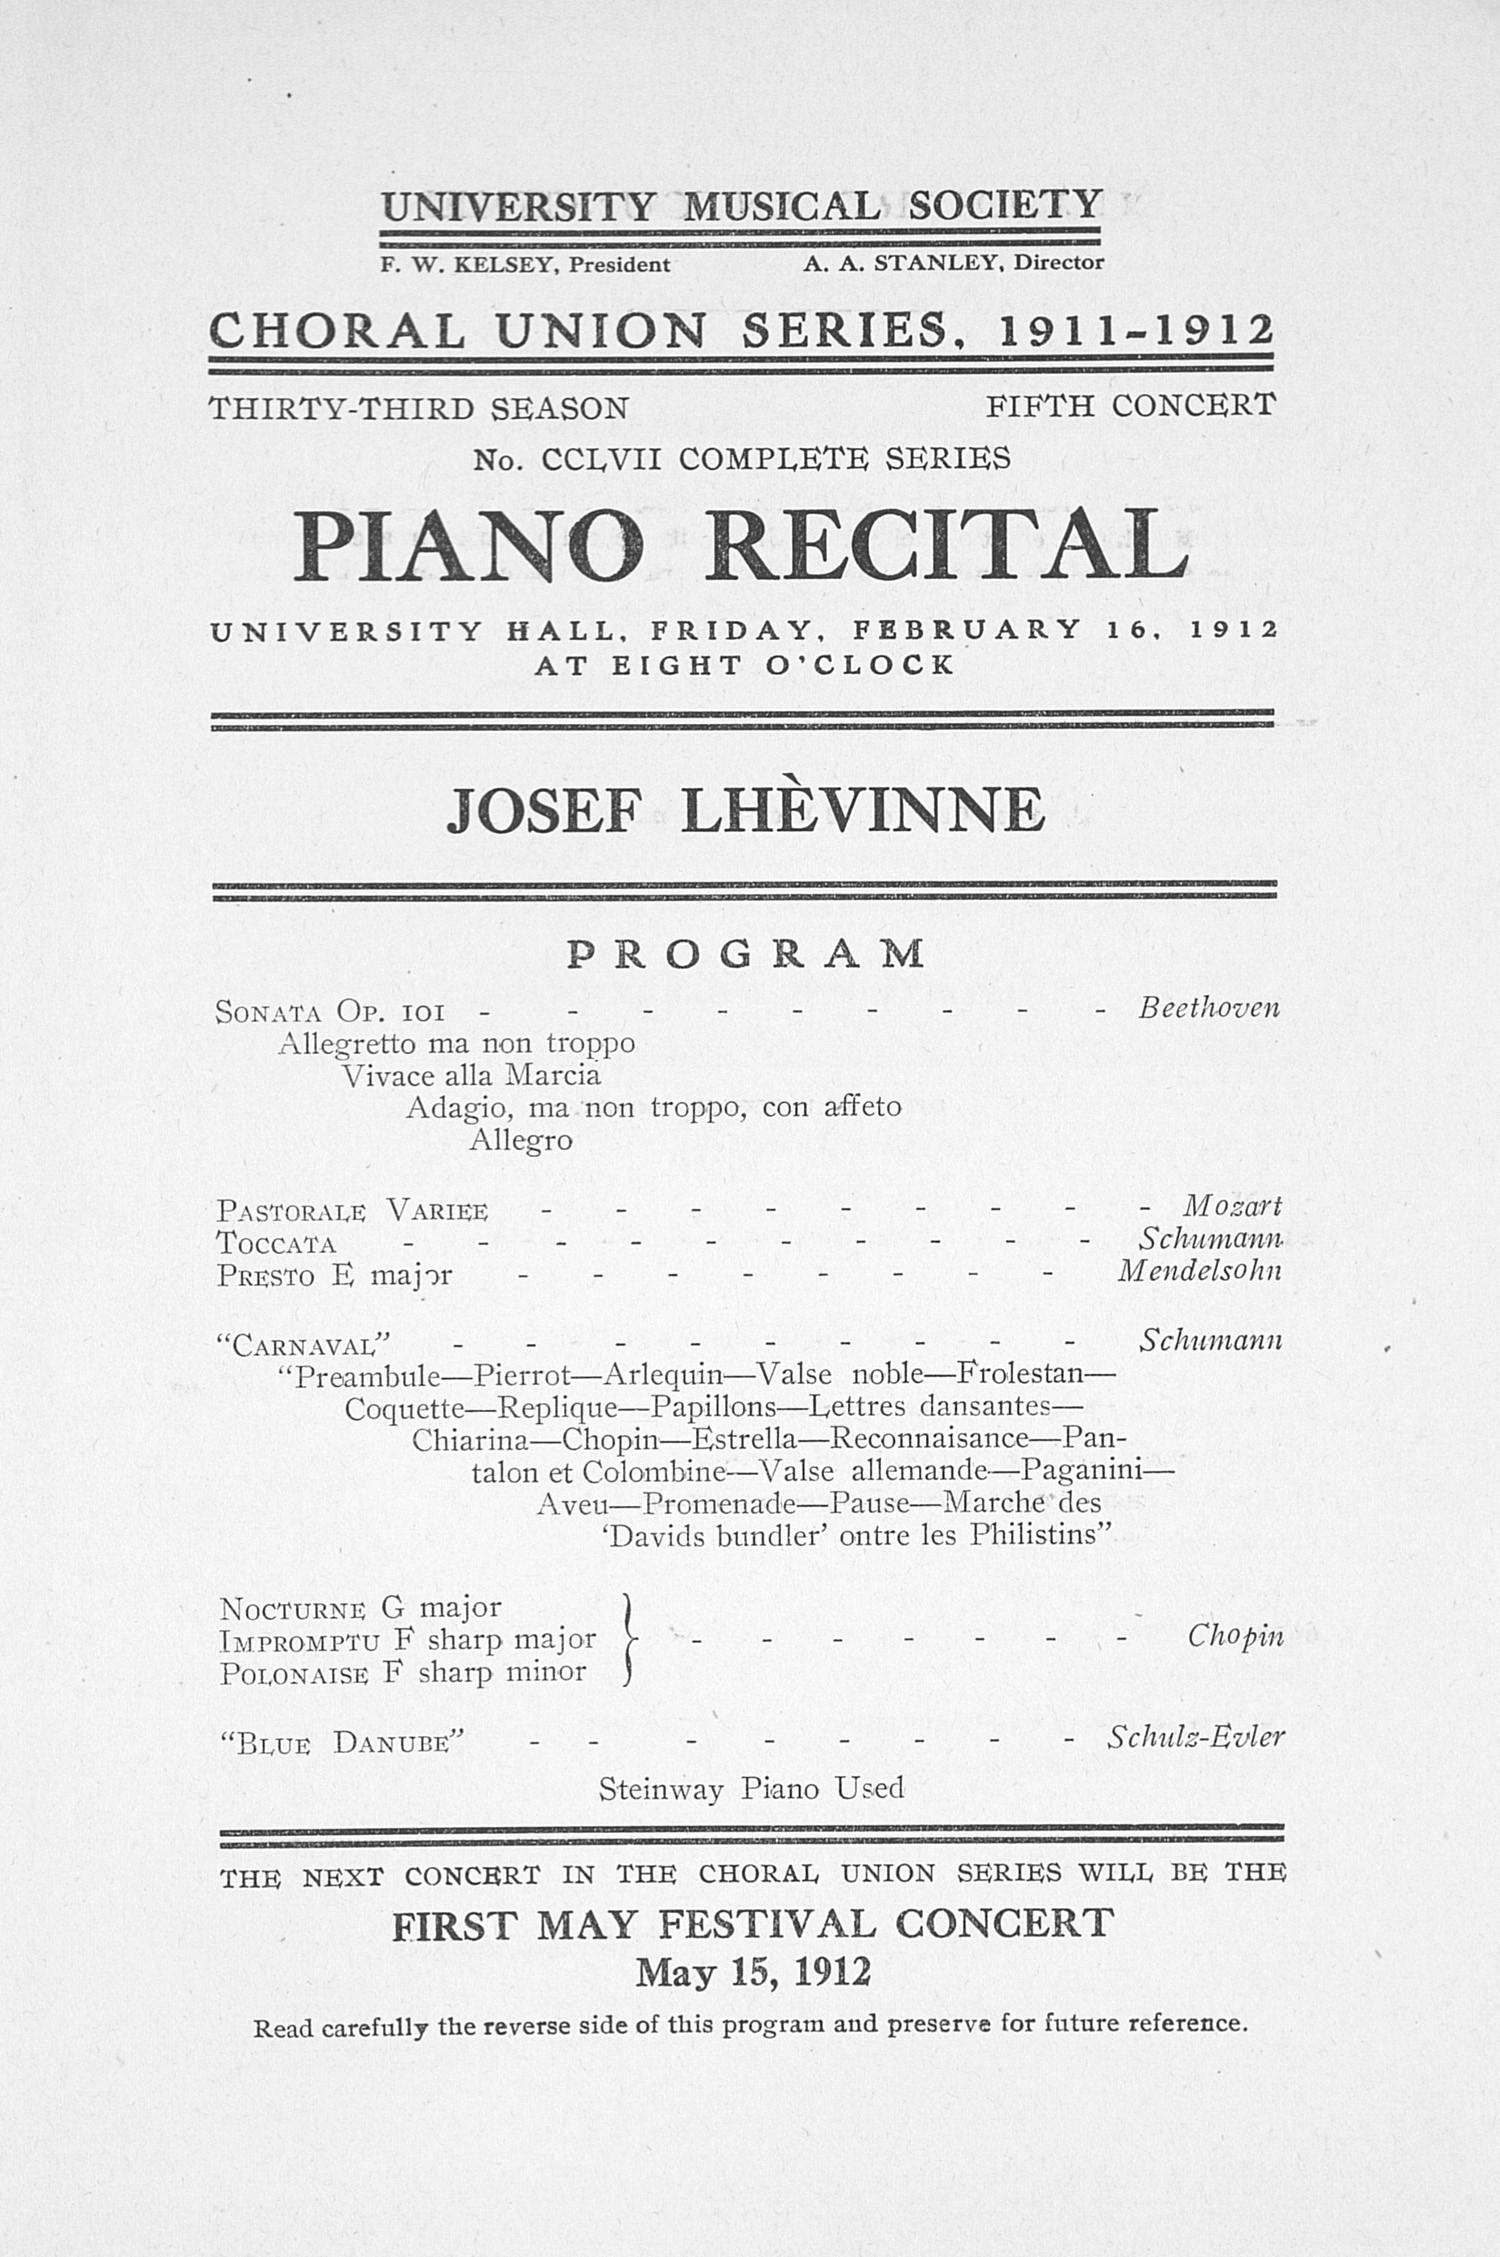 Piano Recital Program Template Free Beautiful Piano Recital Programs Cake Ideas and Designs